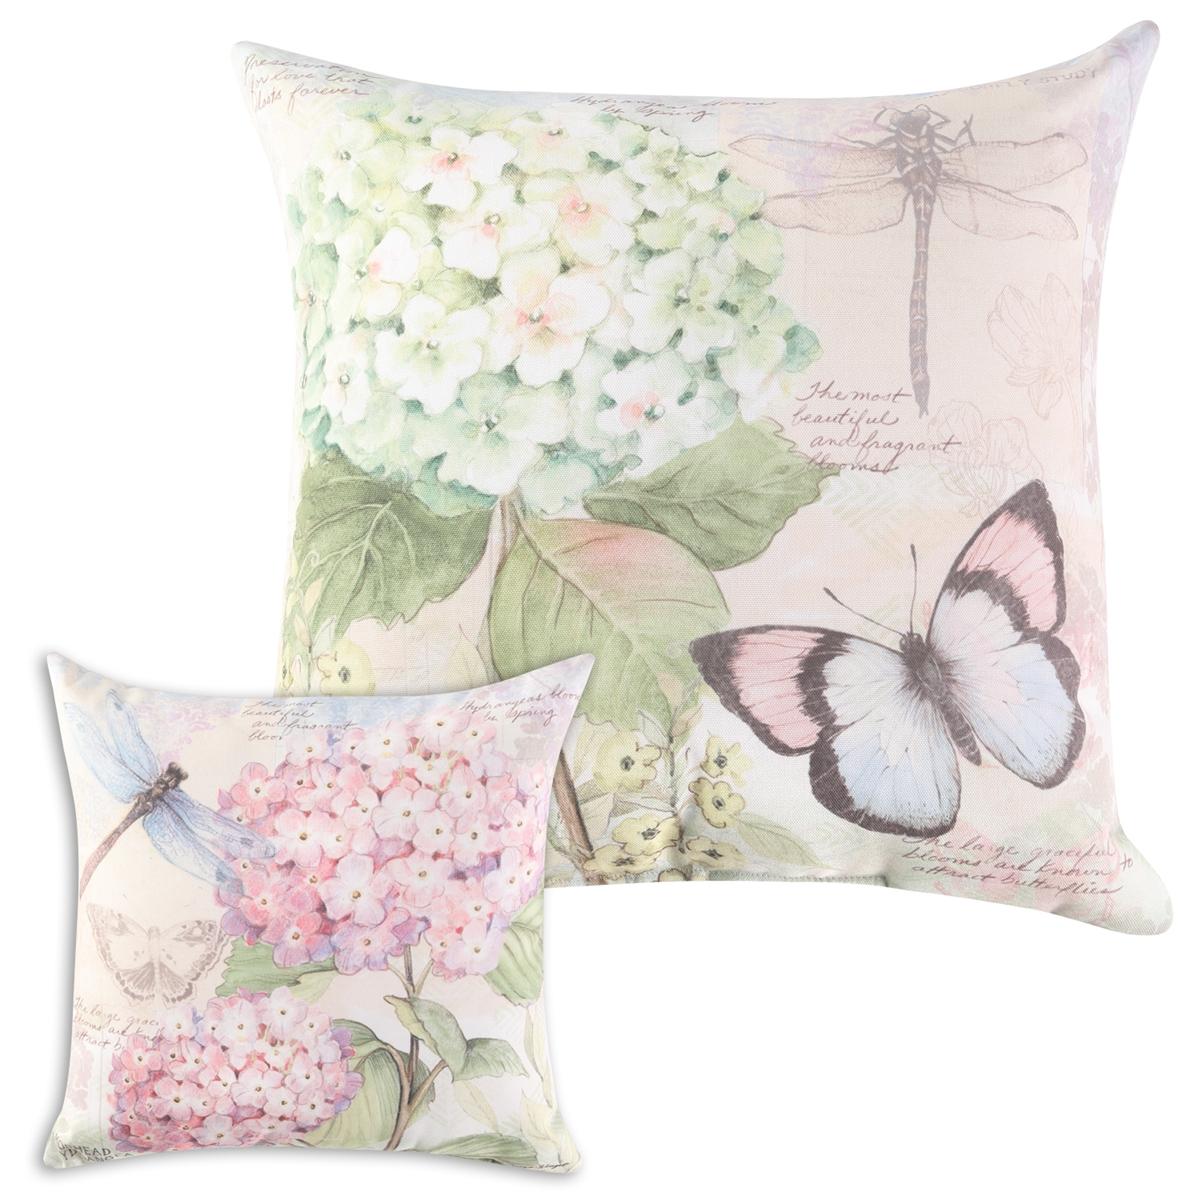 Field Guide Pillow